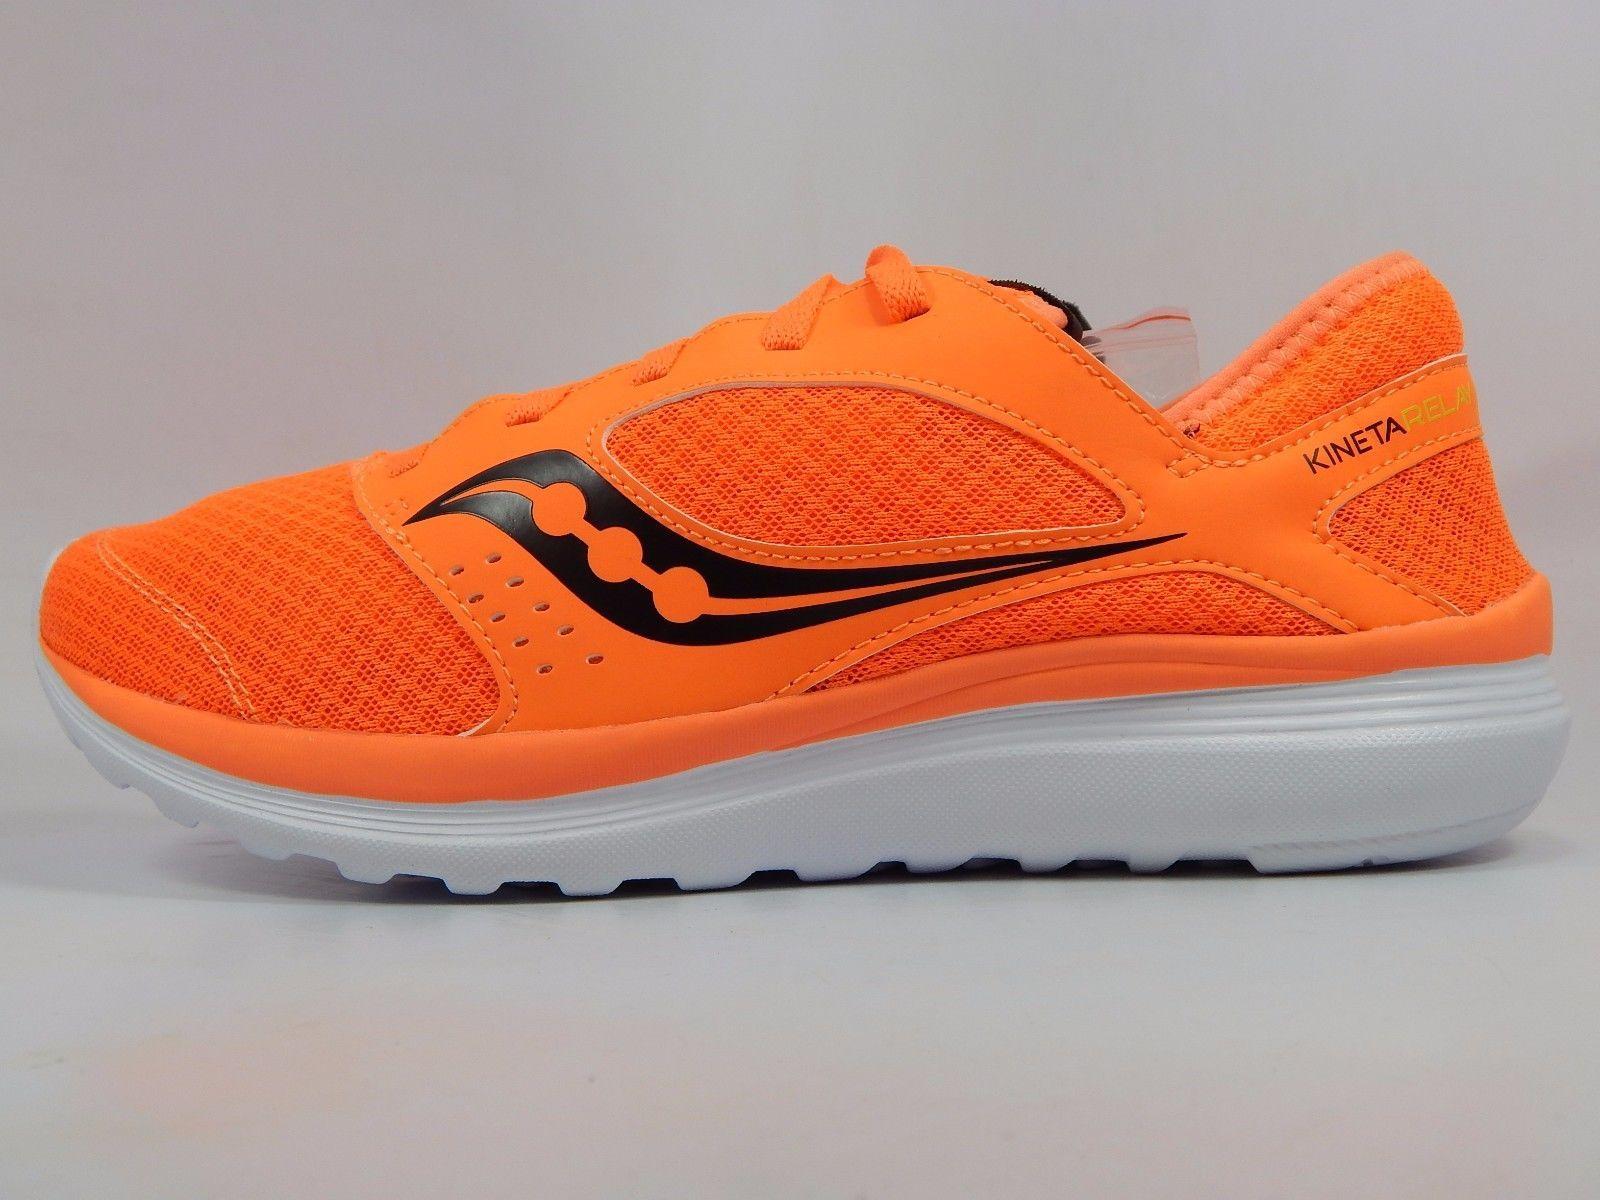 Saucony Kineta Relay Men's Running Shoes Size US 9 M (D) EU 42.5 Orange S25244-7